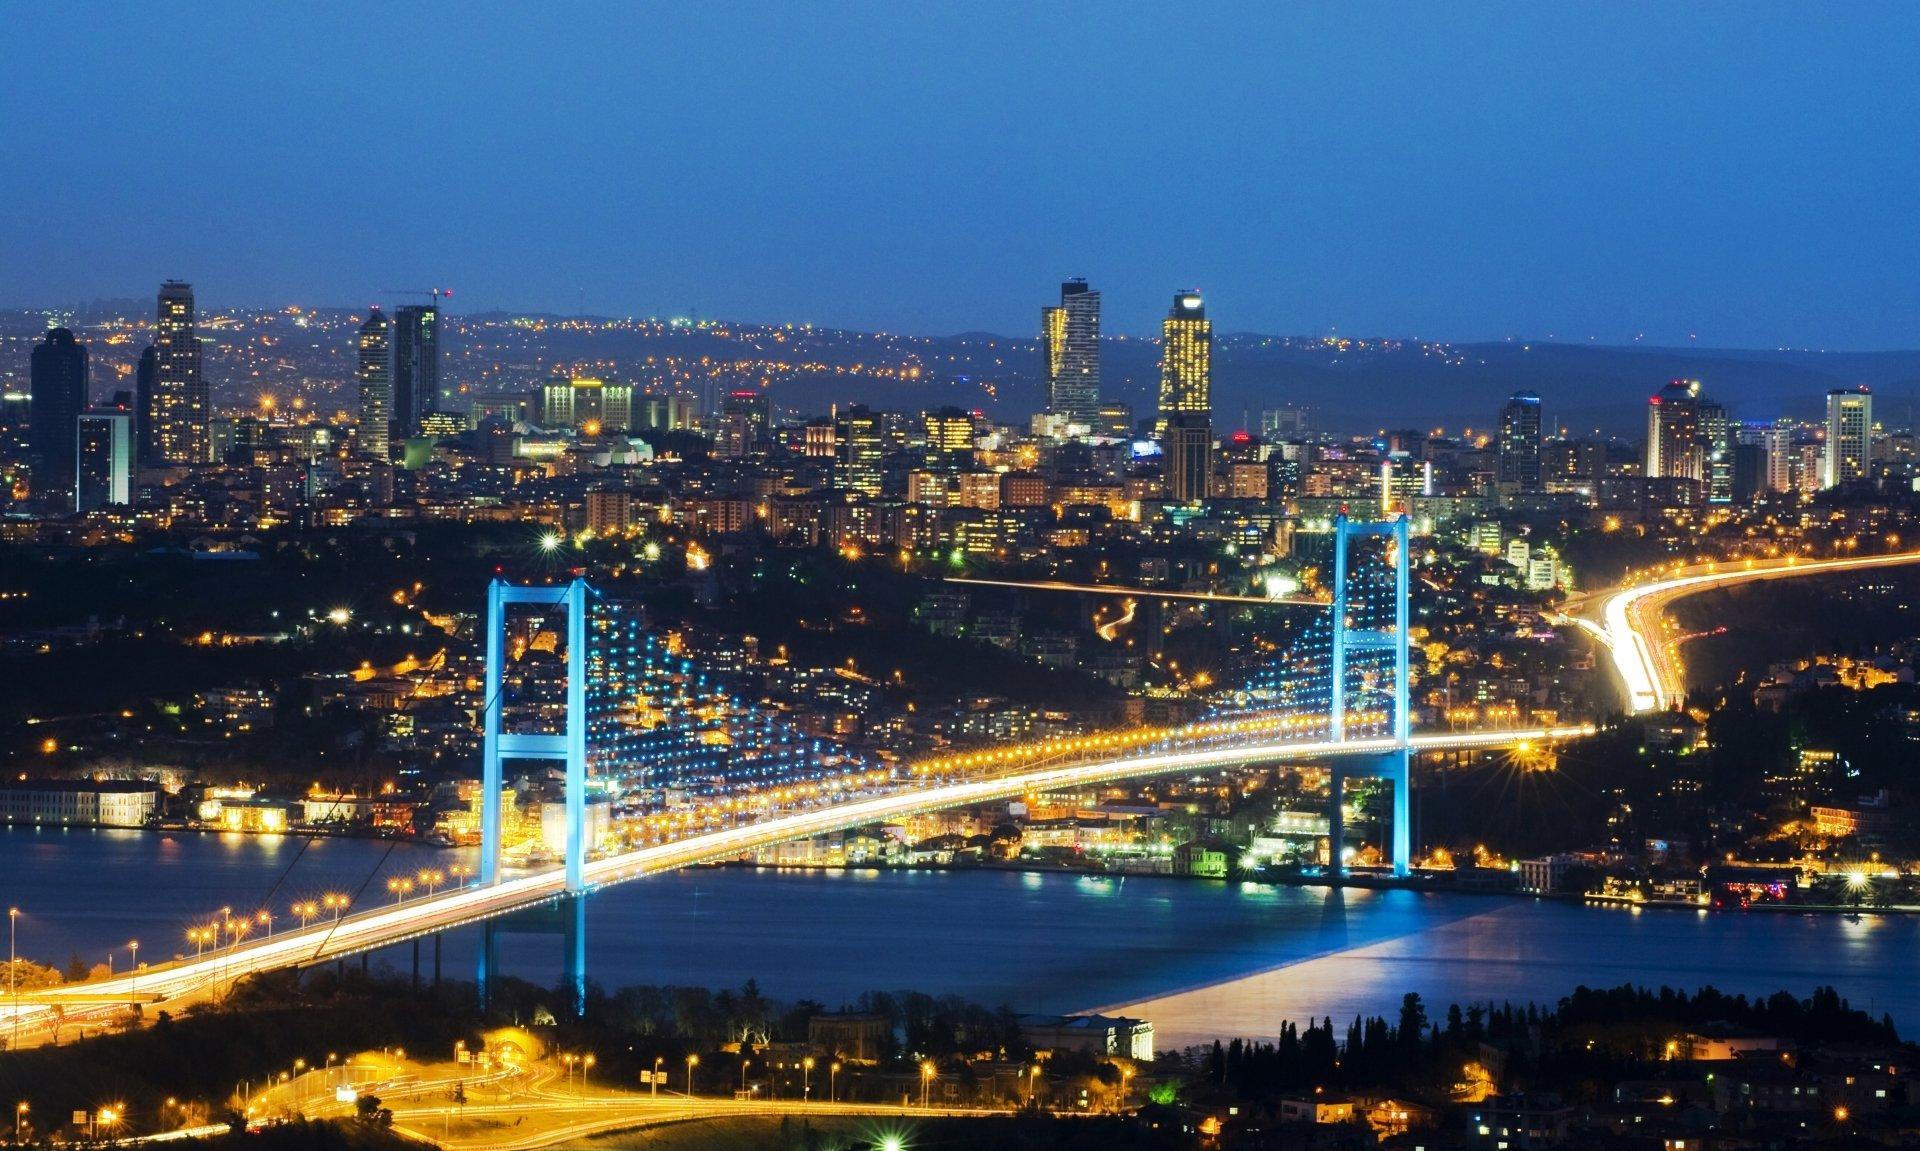 The night view of Bosphorus brudge 8k Ultra HD Wallpaper ...